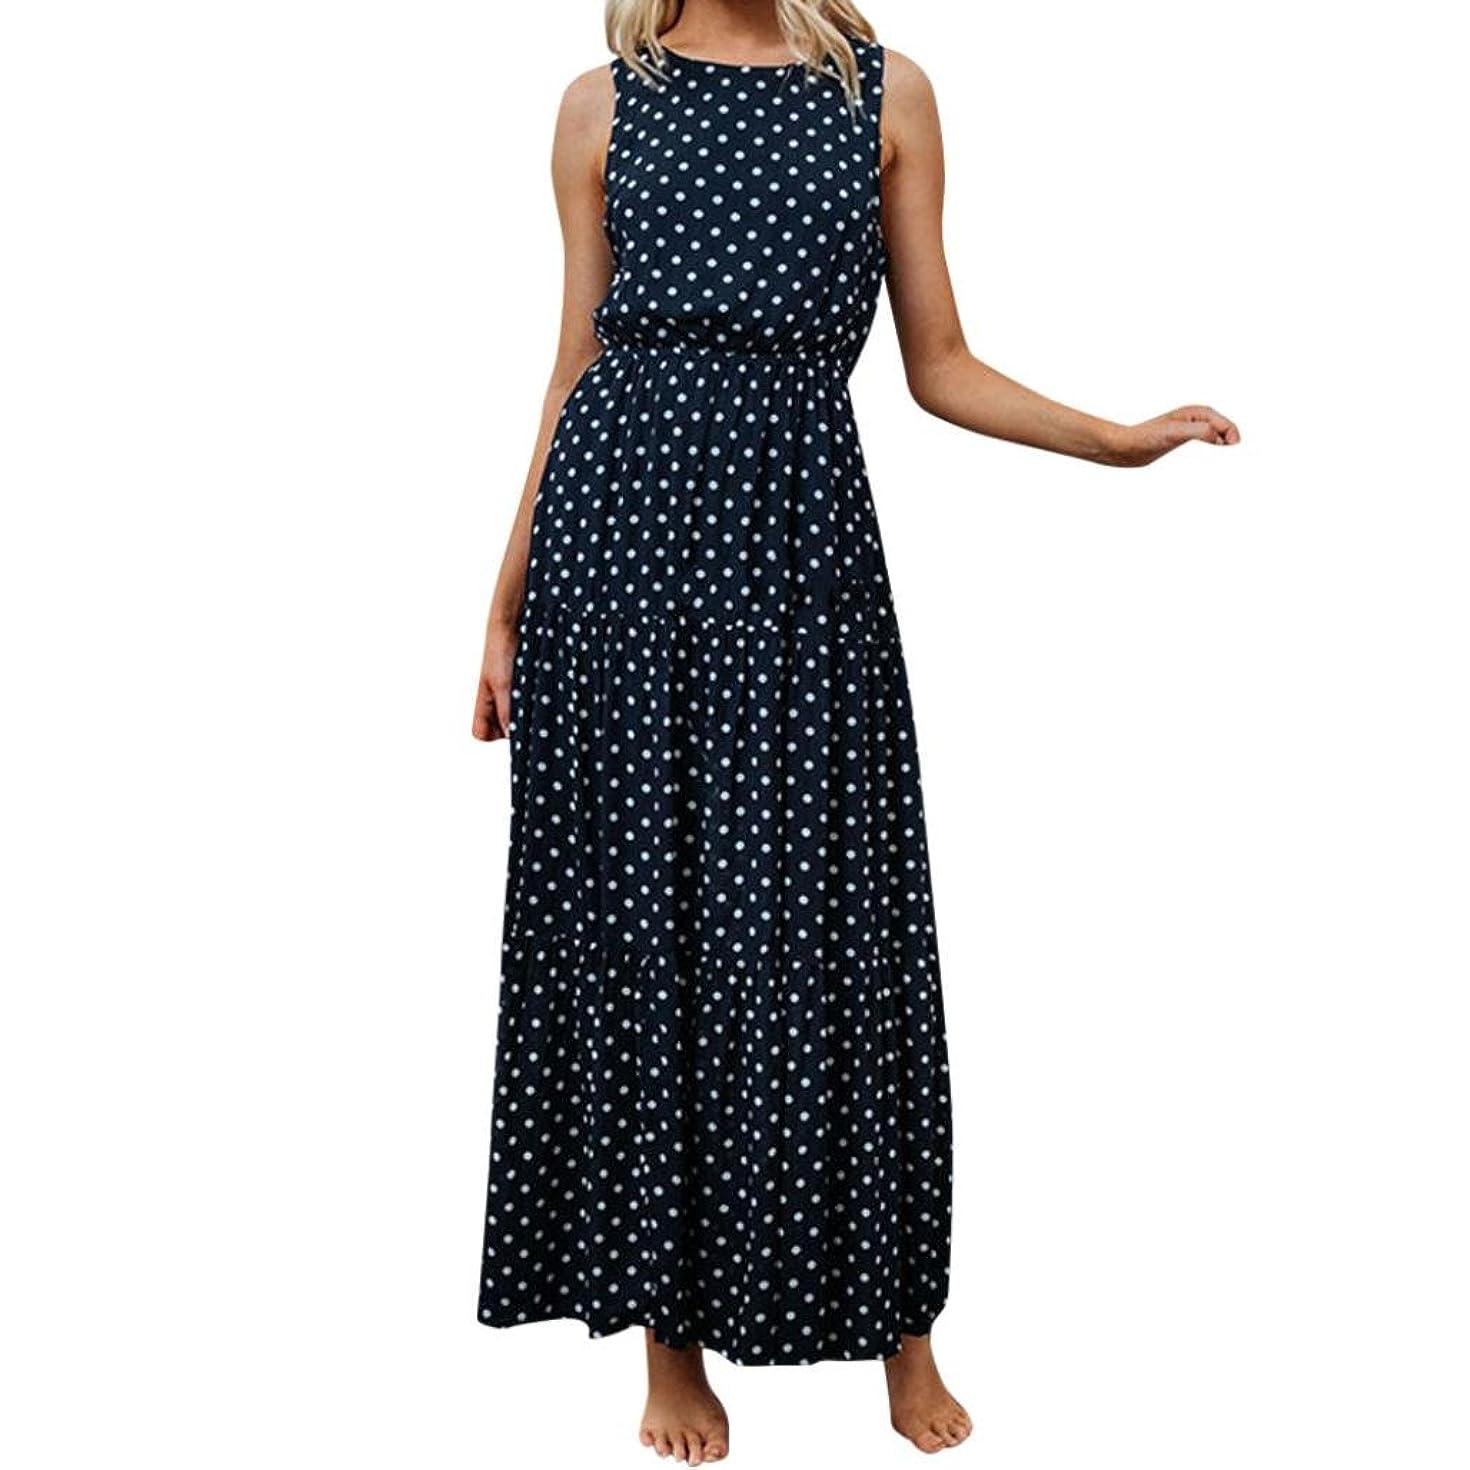 Hemlock Long American Flag Dress, Women Flag Printed Dress Sleeveless Tank Beach Maxi Sundres (L, Navy)